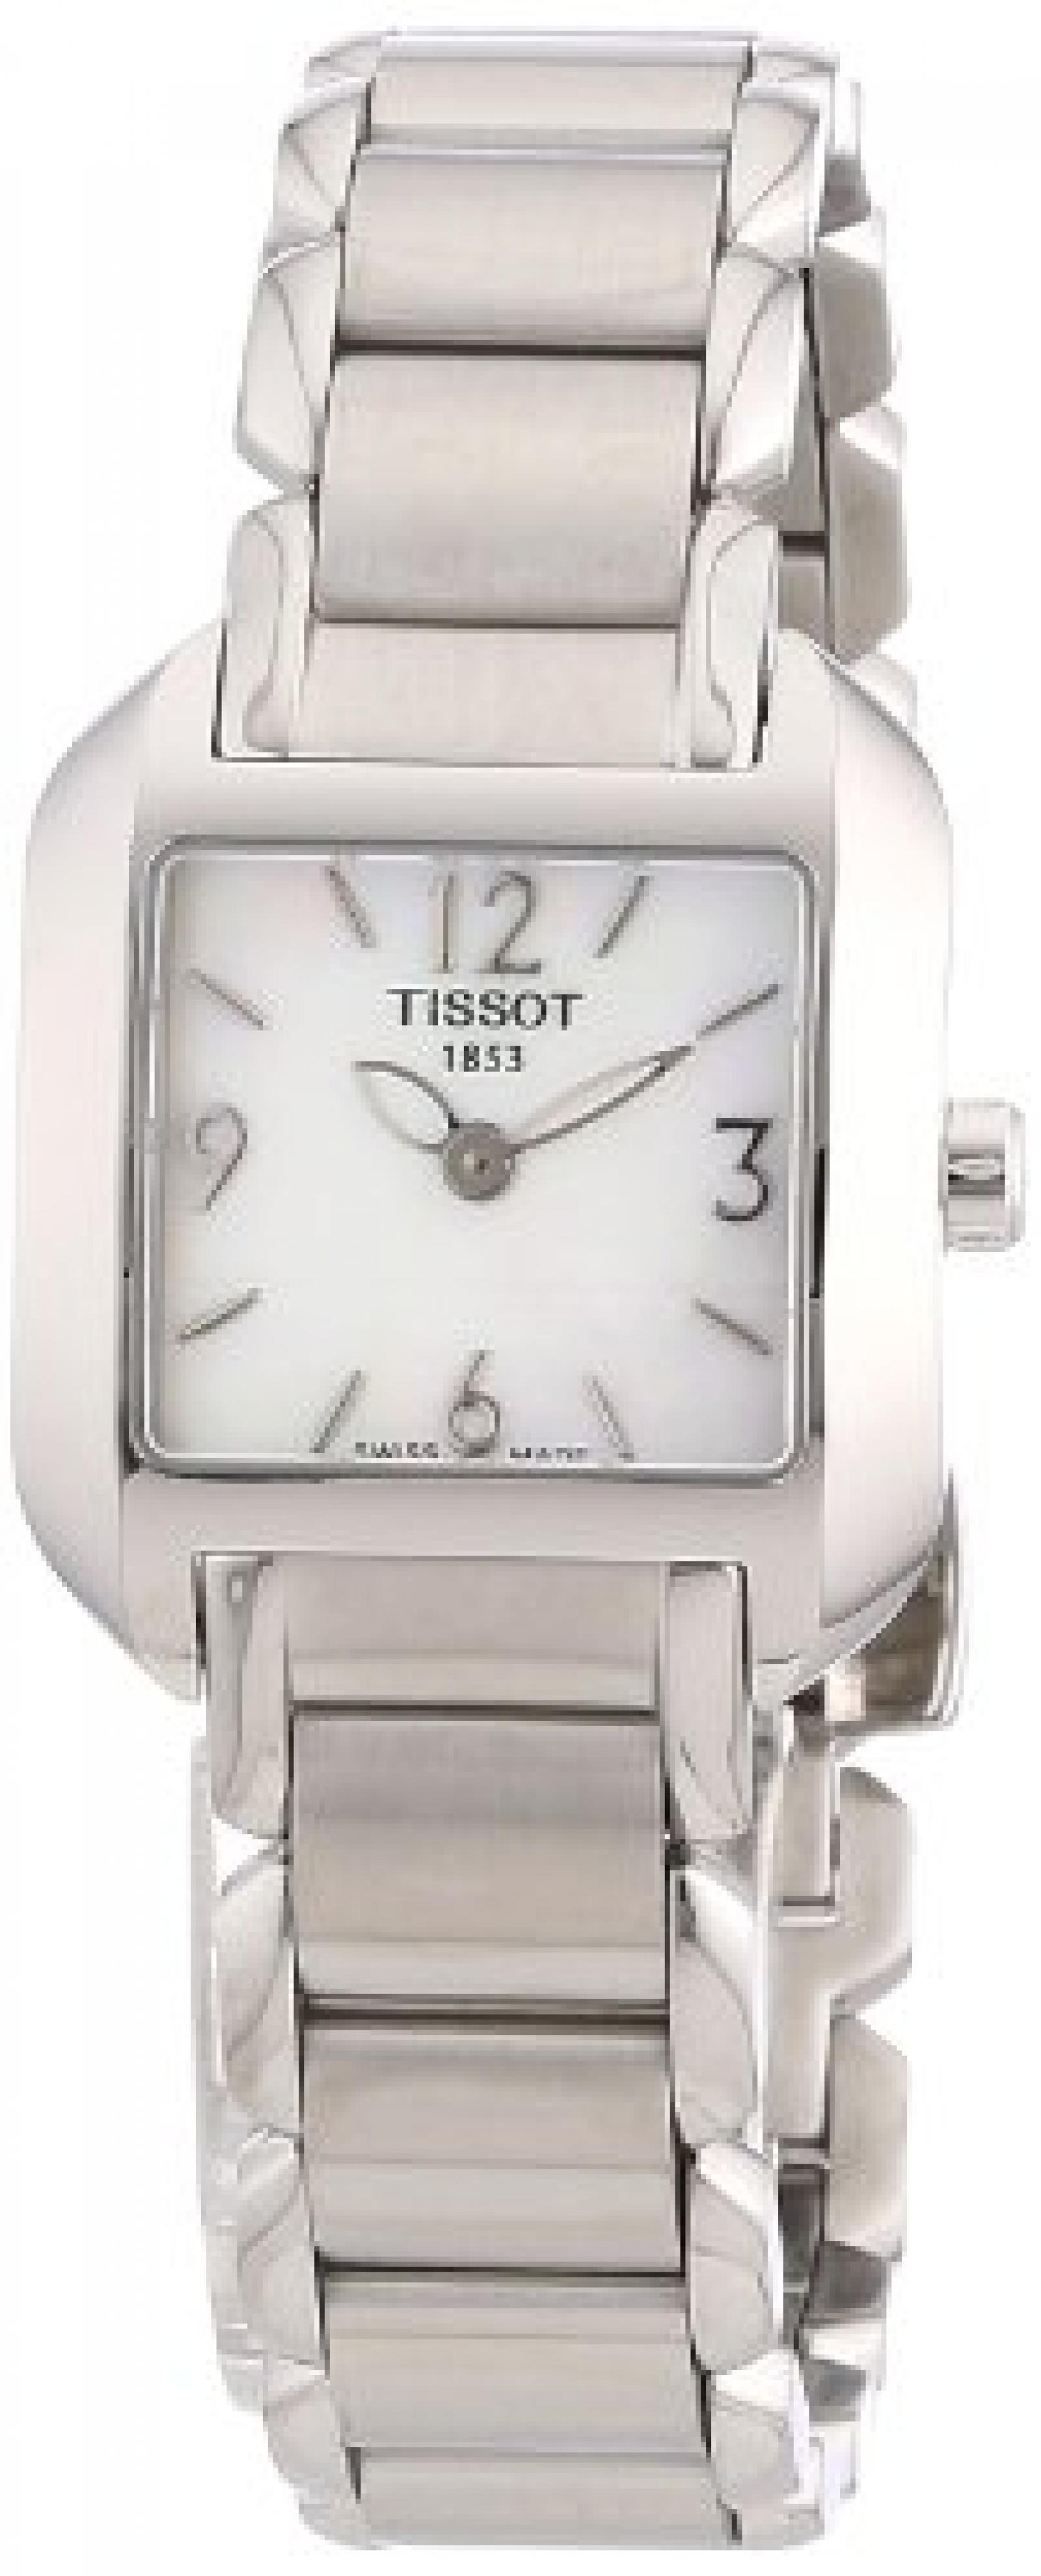 TISSOT Damenuhr T-WAVE T02128582